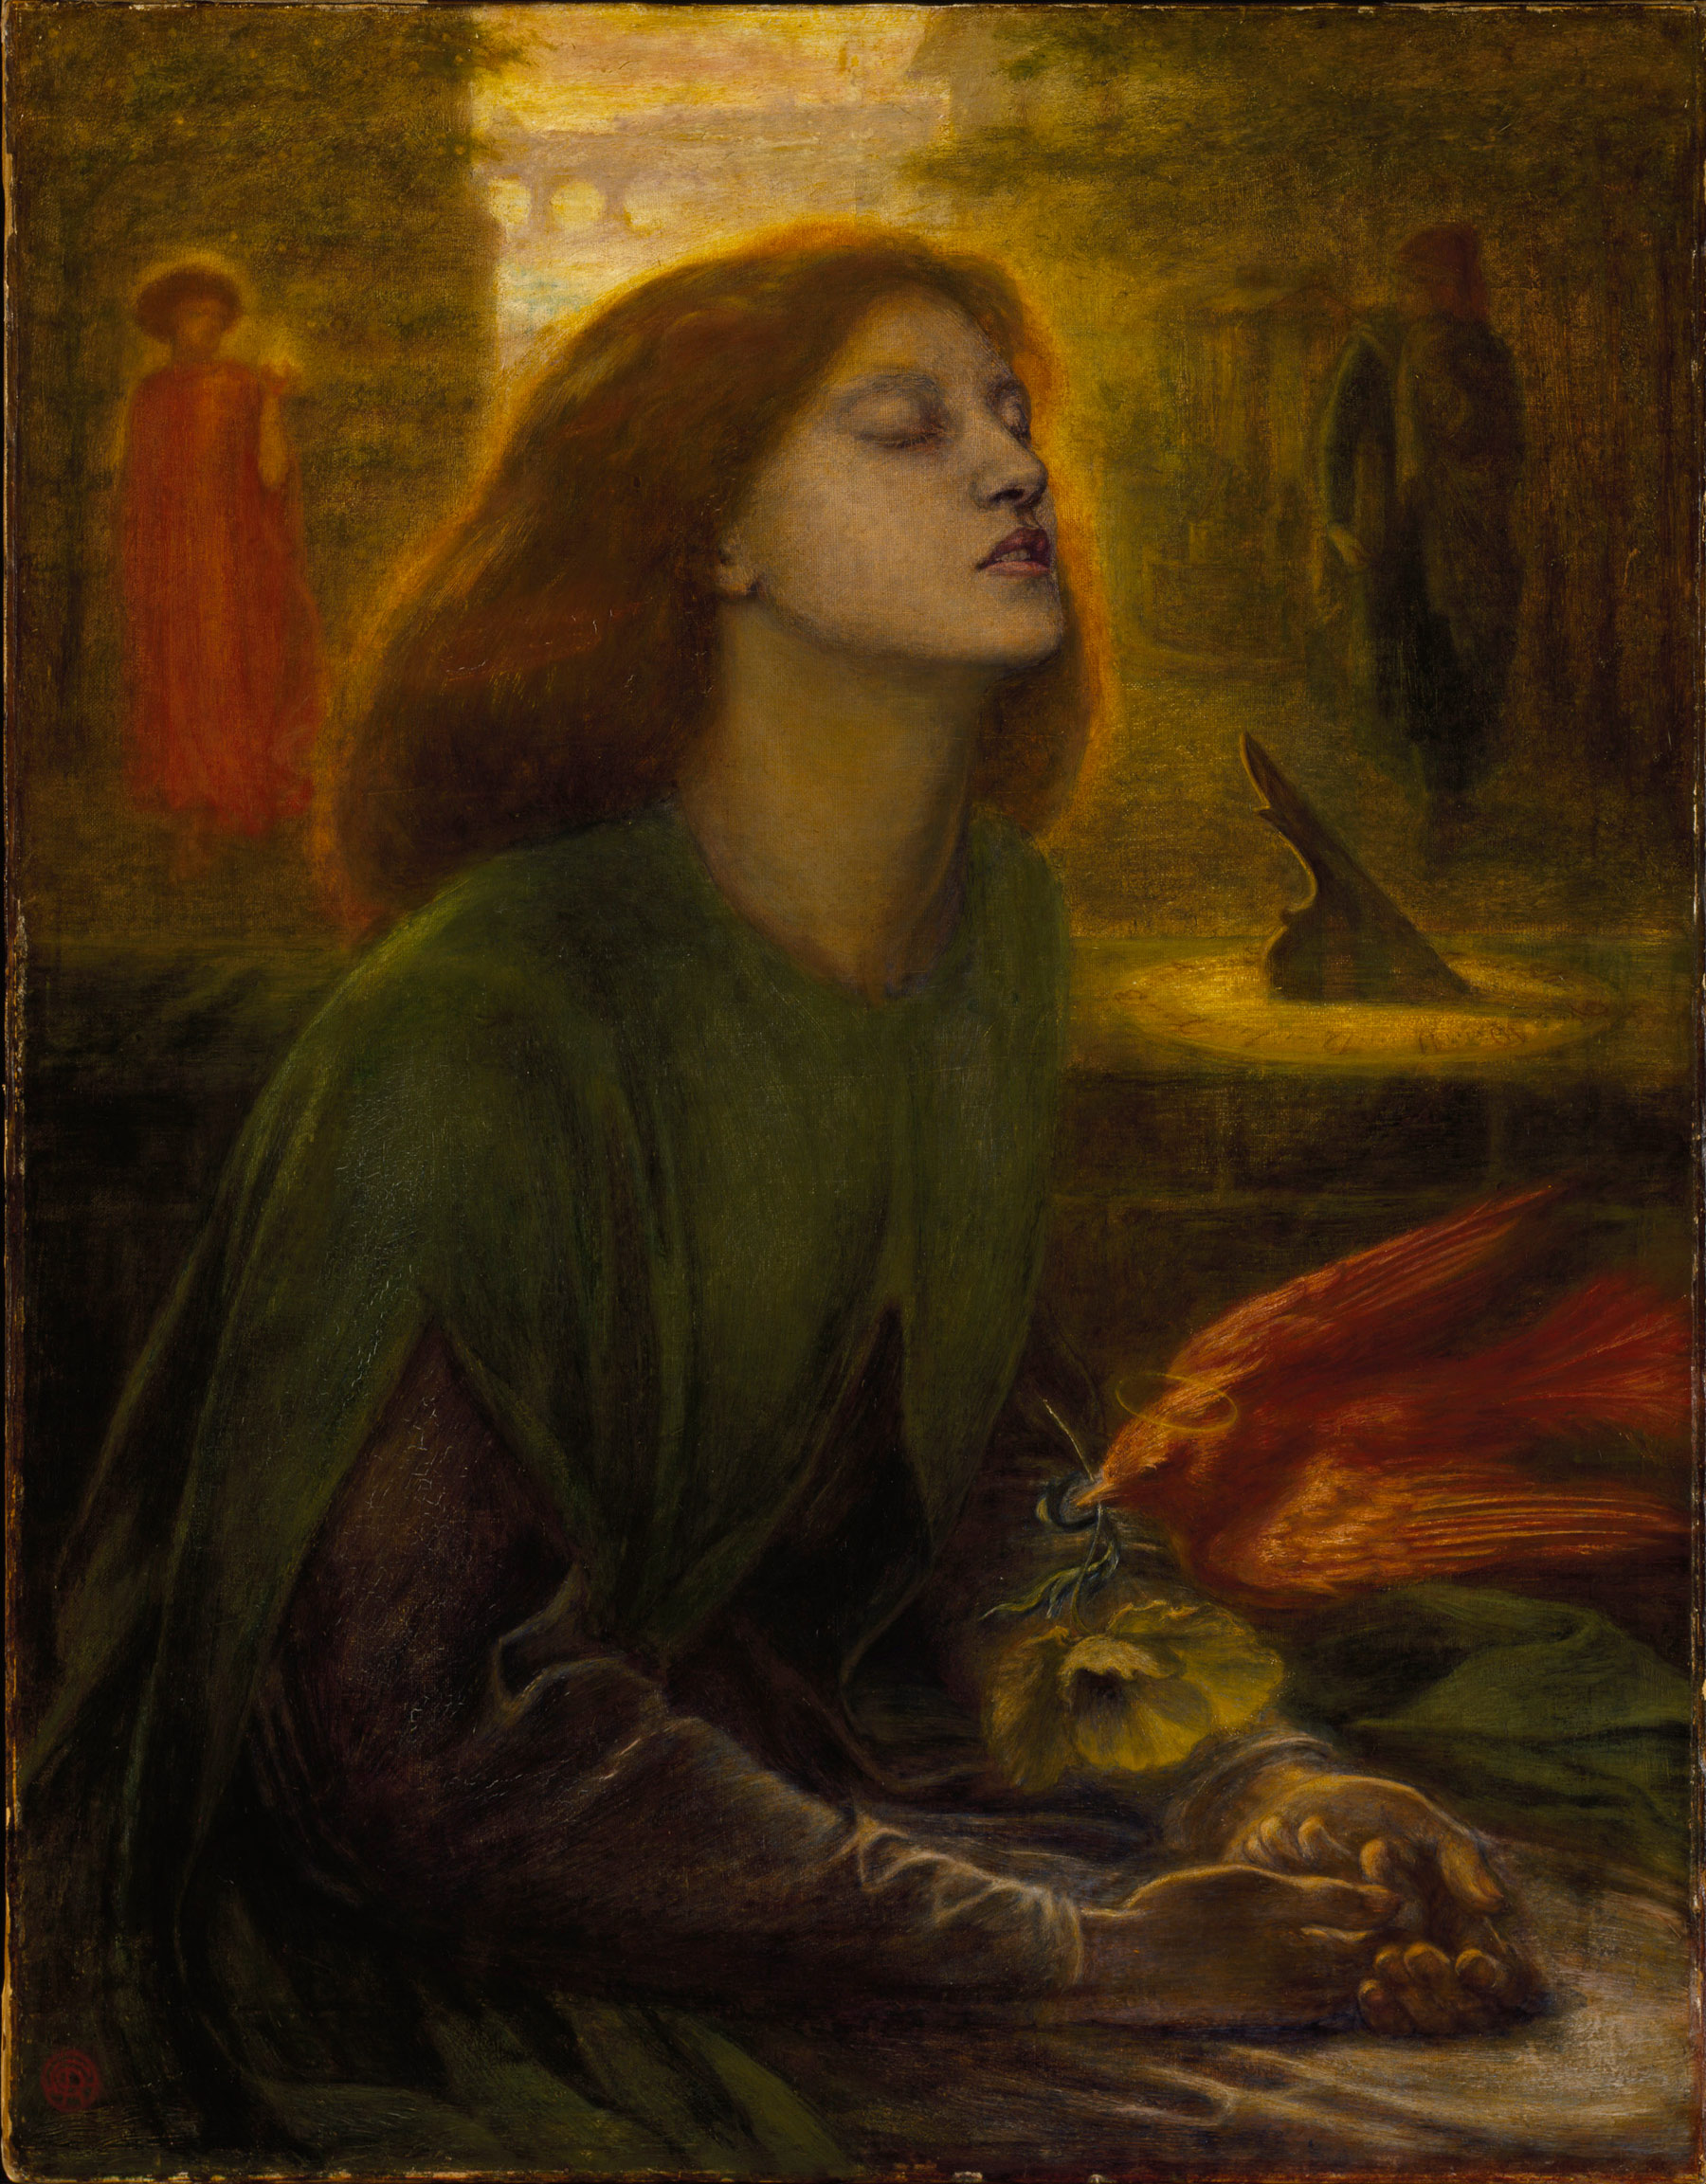 Dante Gabriel Rossetti, Beata Beatrix (1864-1870 circa; olio su tela, 86,4 x 66 cm; Londra, Tate Britain)